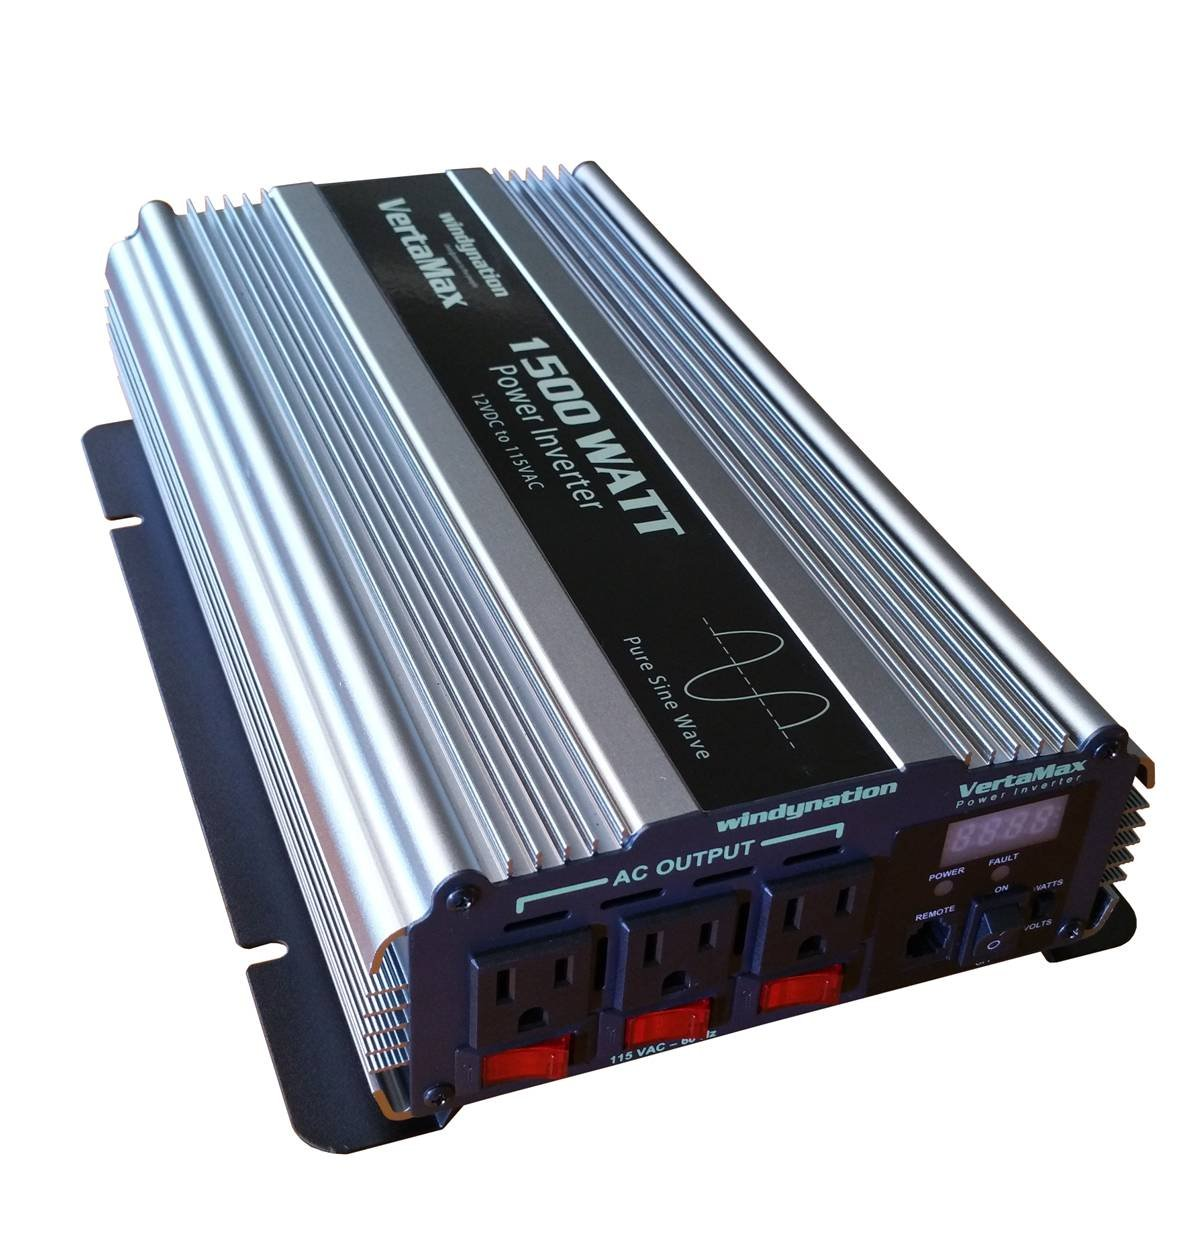 VertaMax PURE SINE WAVE 1500 Watt (3000W Surge) 12V Power Inverter DC to 115 AC Car, Solar, Off-Grid, RV, Back Up Power